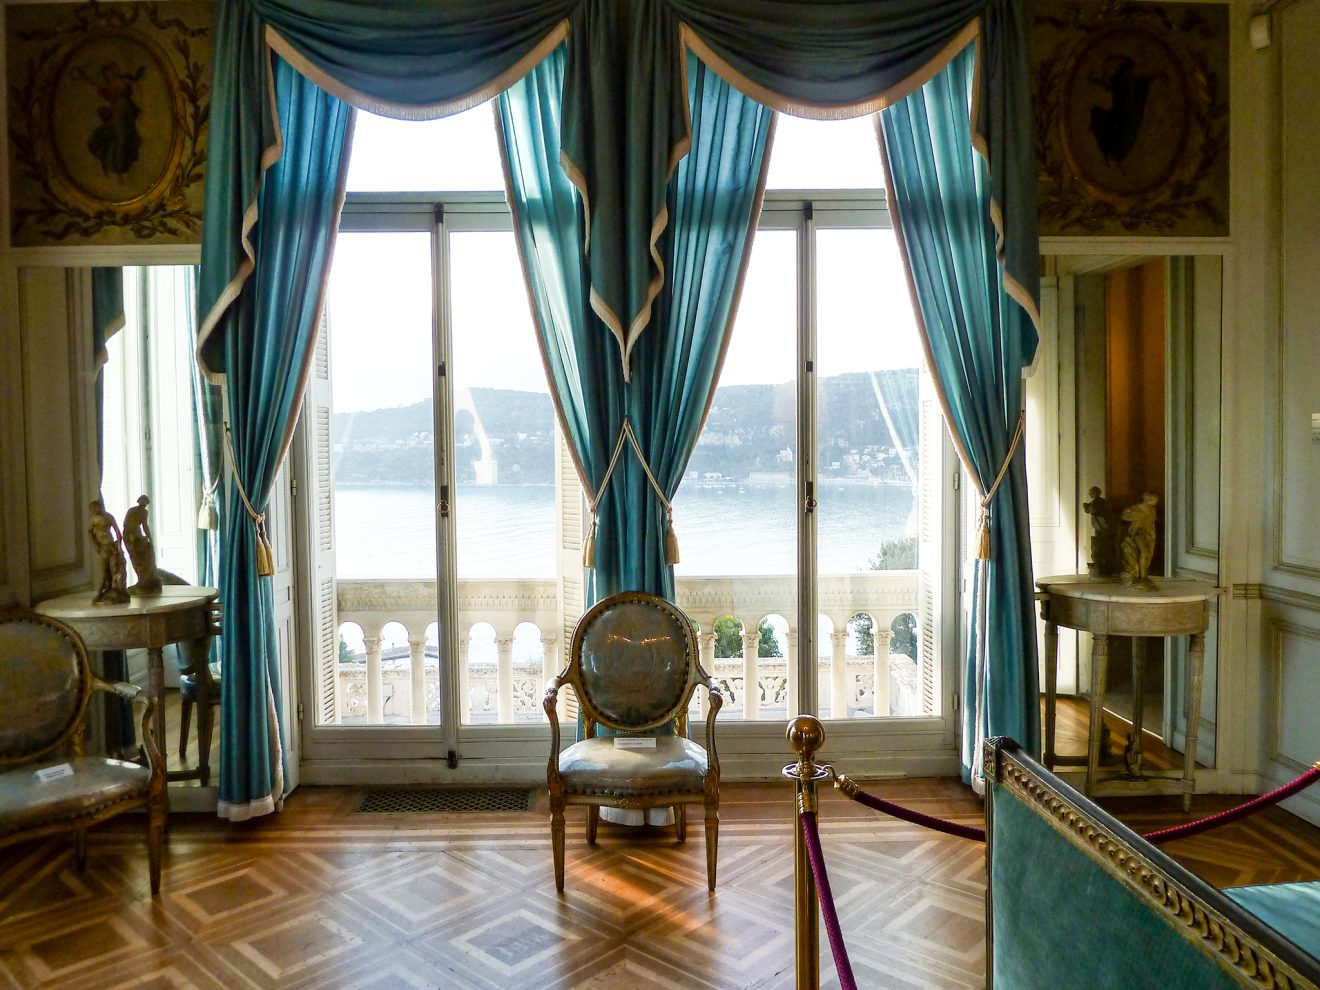 Villa Ephrussi de Rothschildam Saint-Jean Cap Ferrat Cote d'Azur